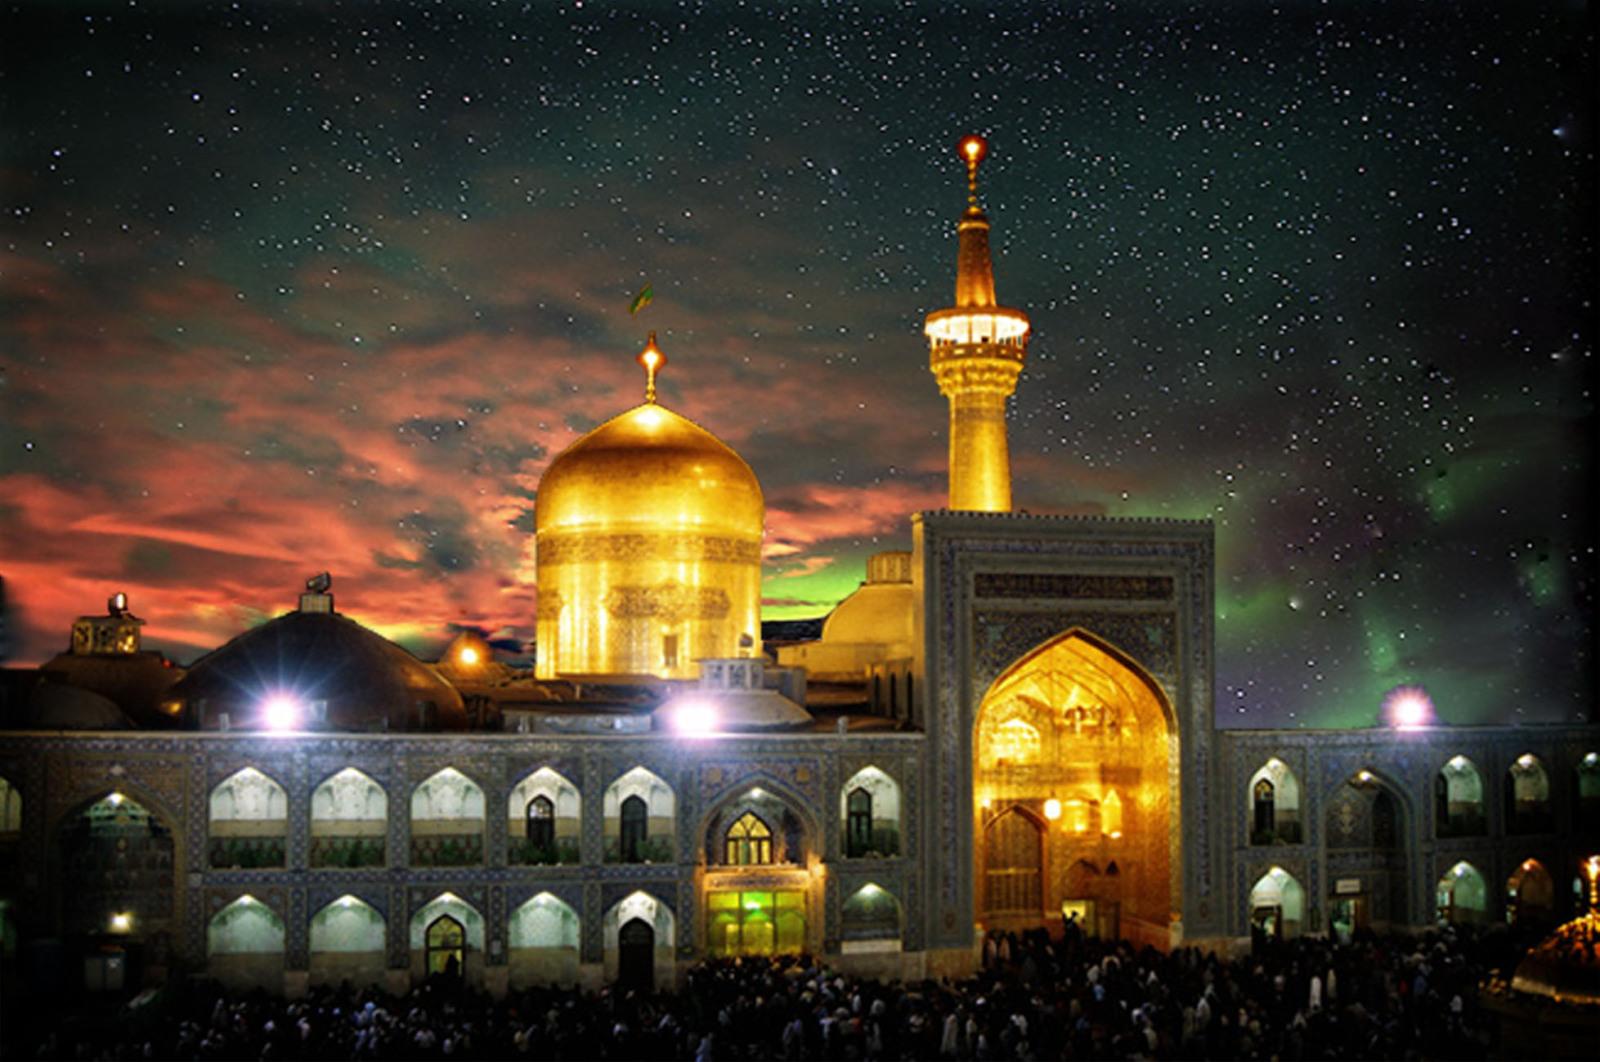 حرم رضوی،معماری اسلامی